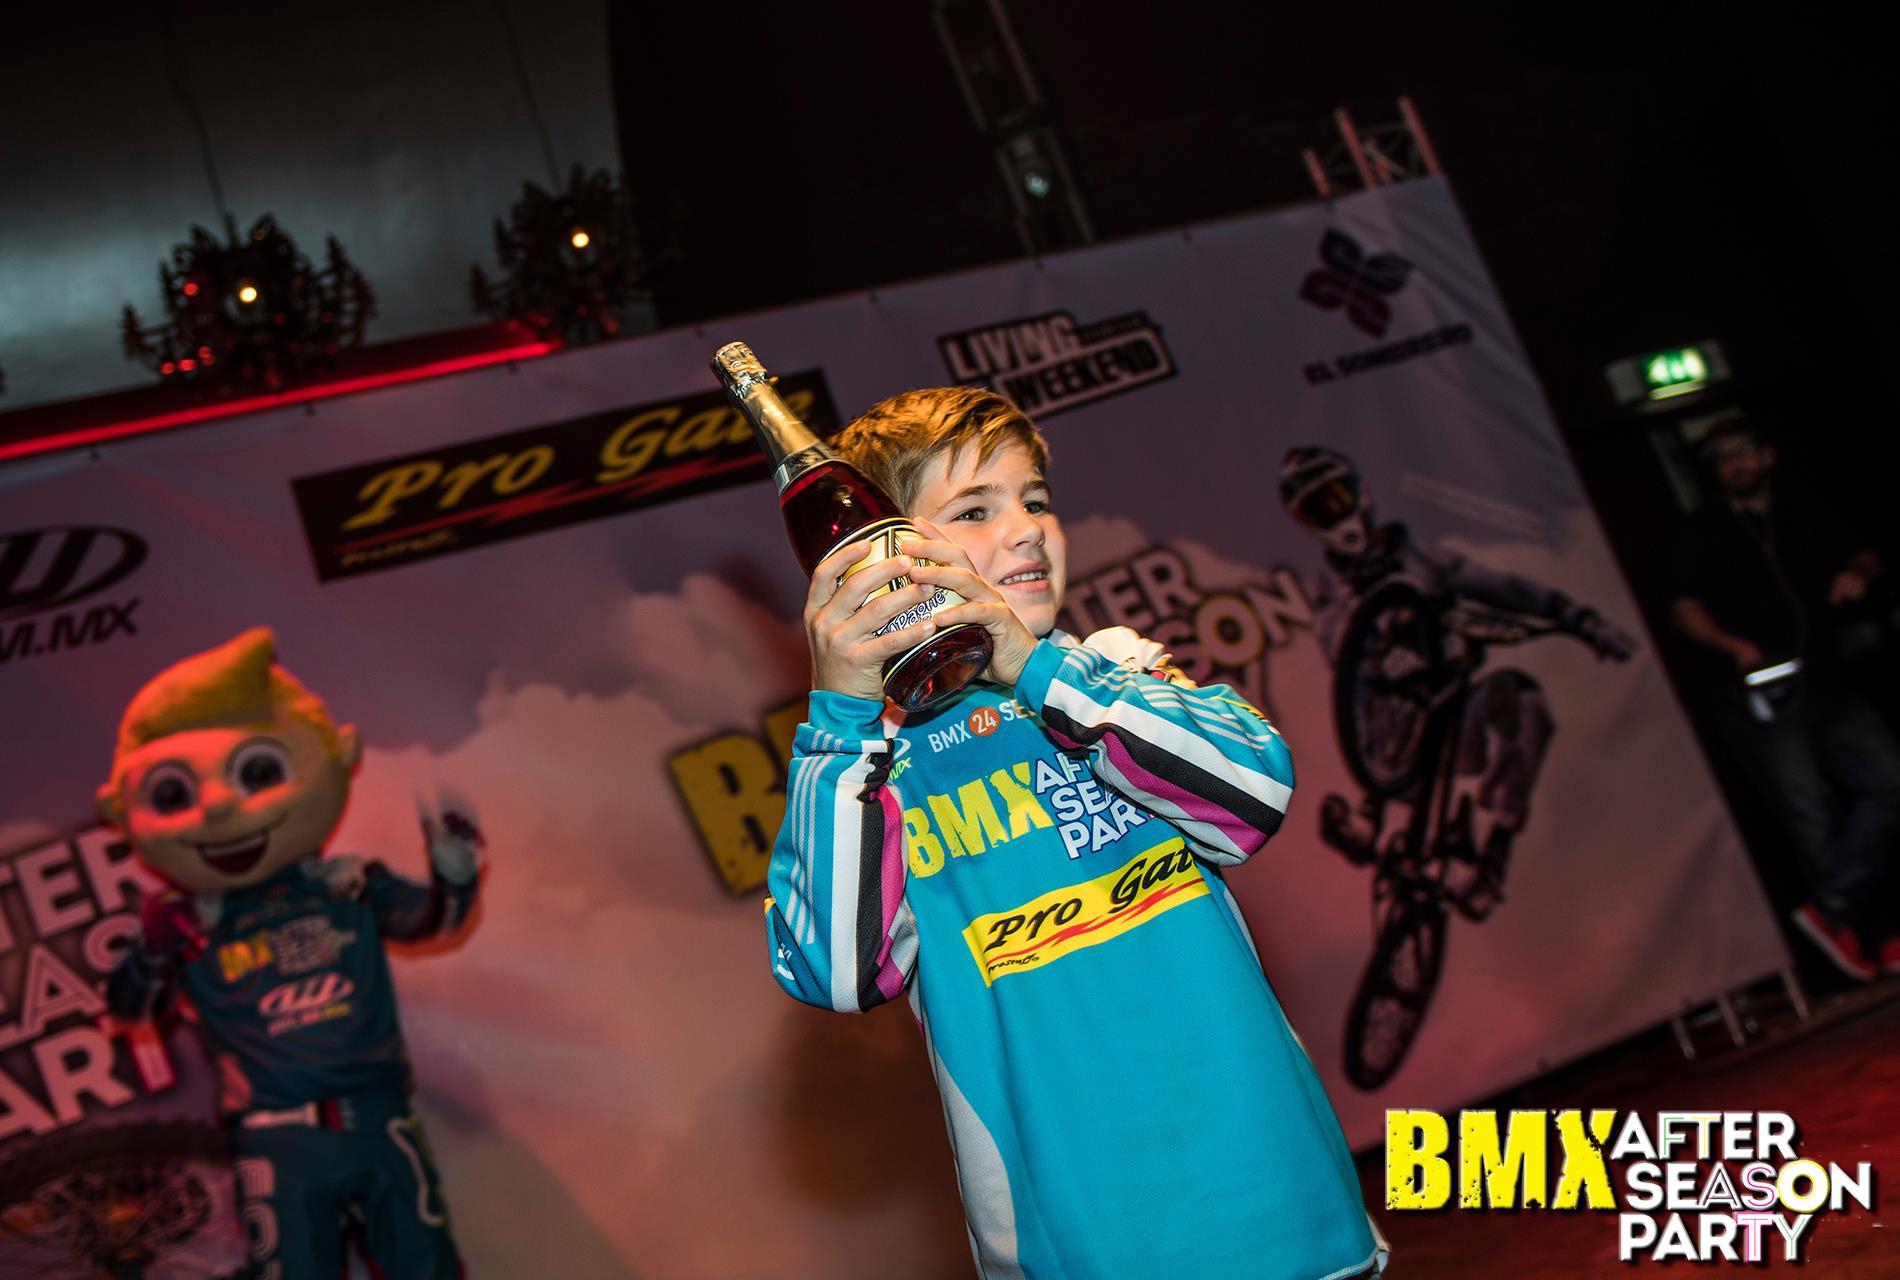 BMX After Season Party 2016